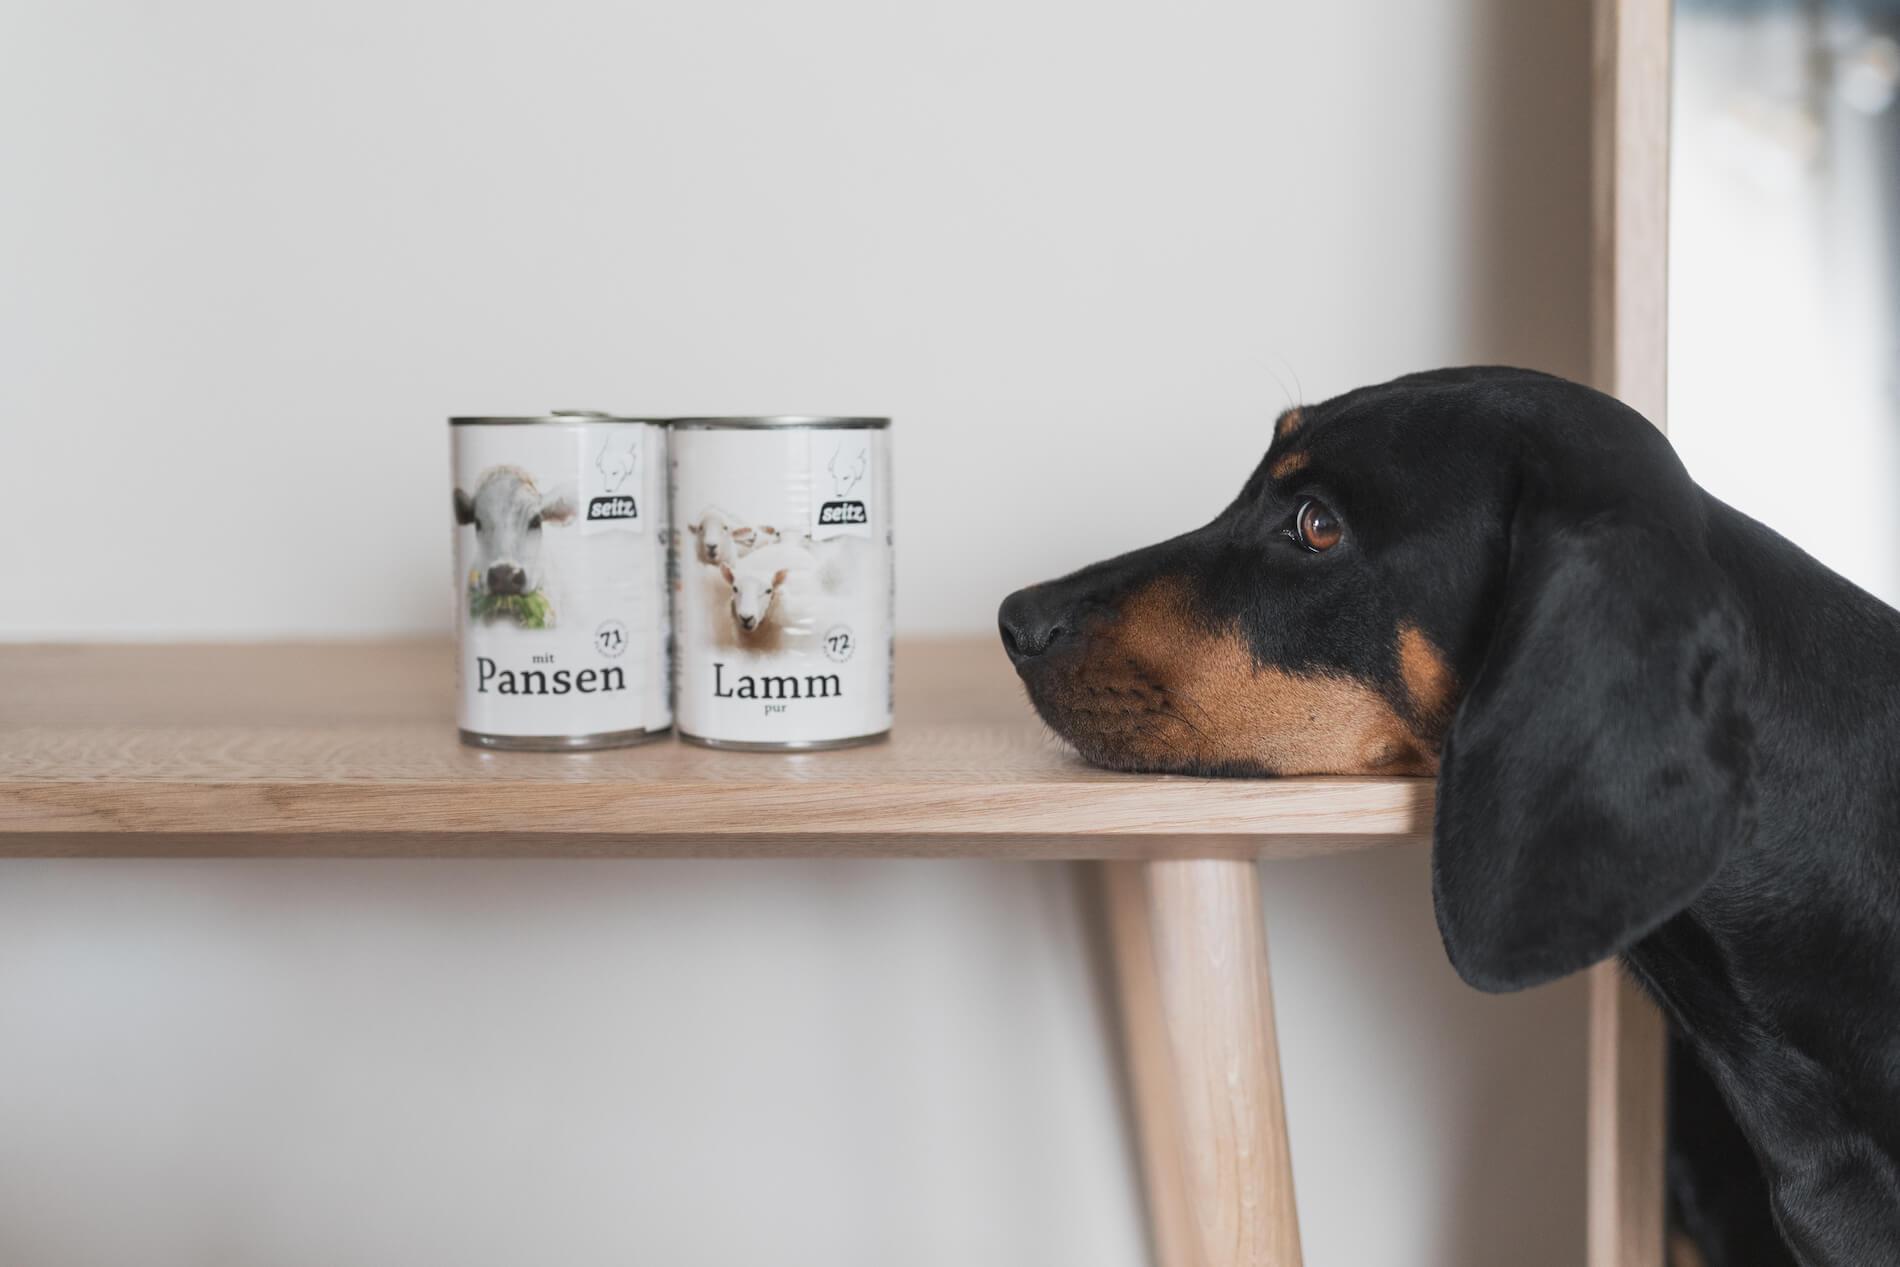 Seitz Tiernahrung GmbH & Co. KG